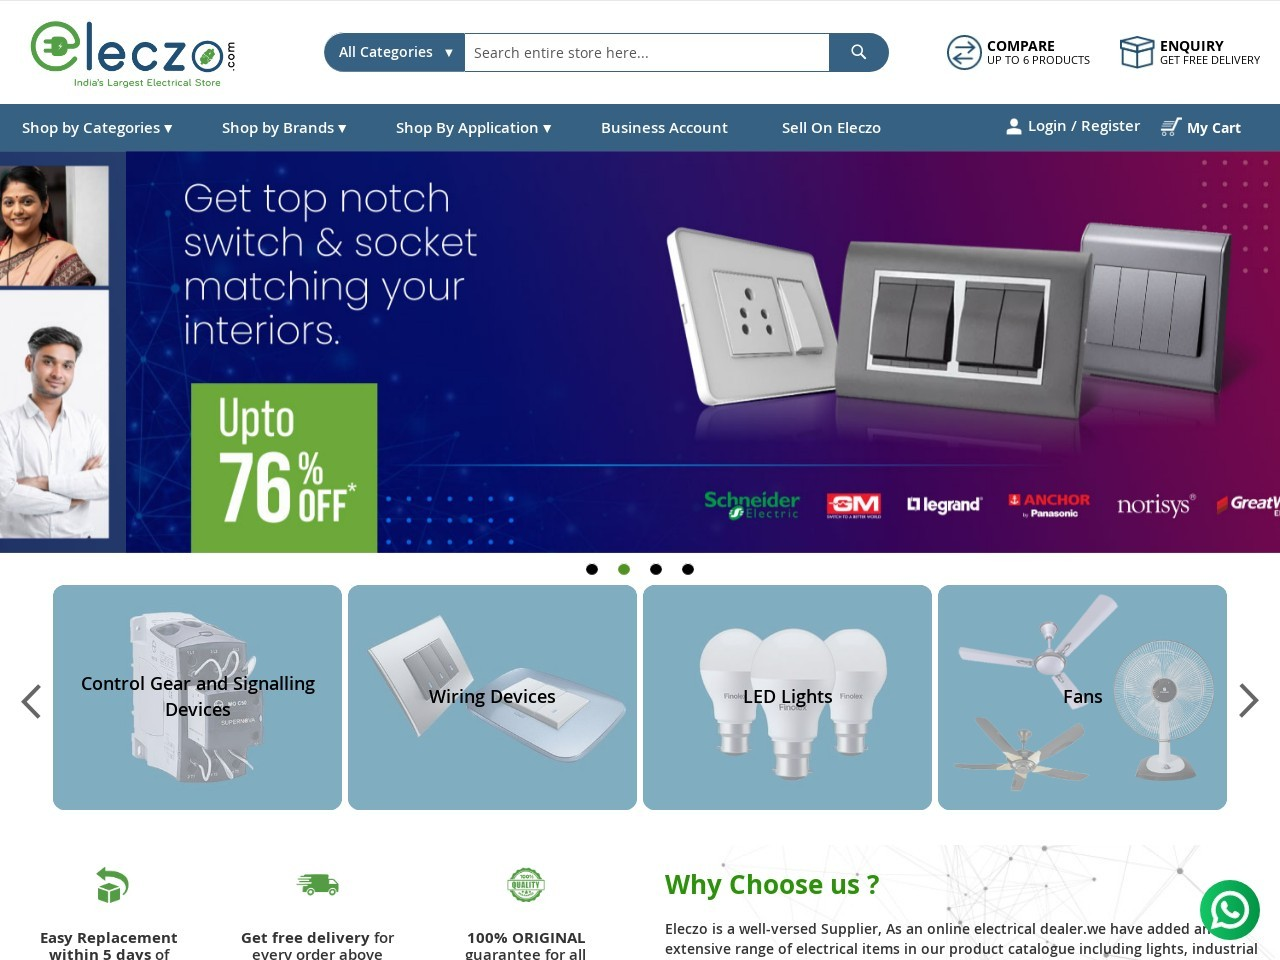 Buy Siemens 5SL52047RC 2 Pole 4 Amp MCB at Online |Eleczo.com